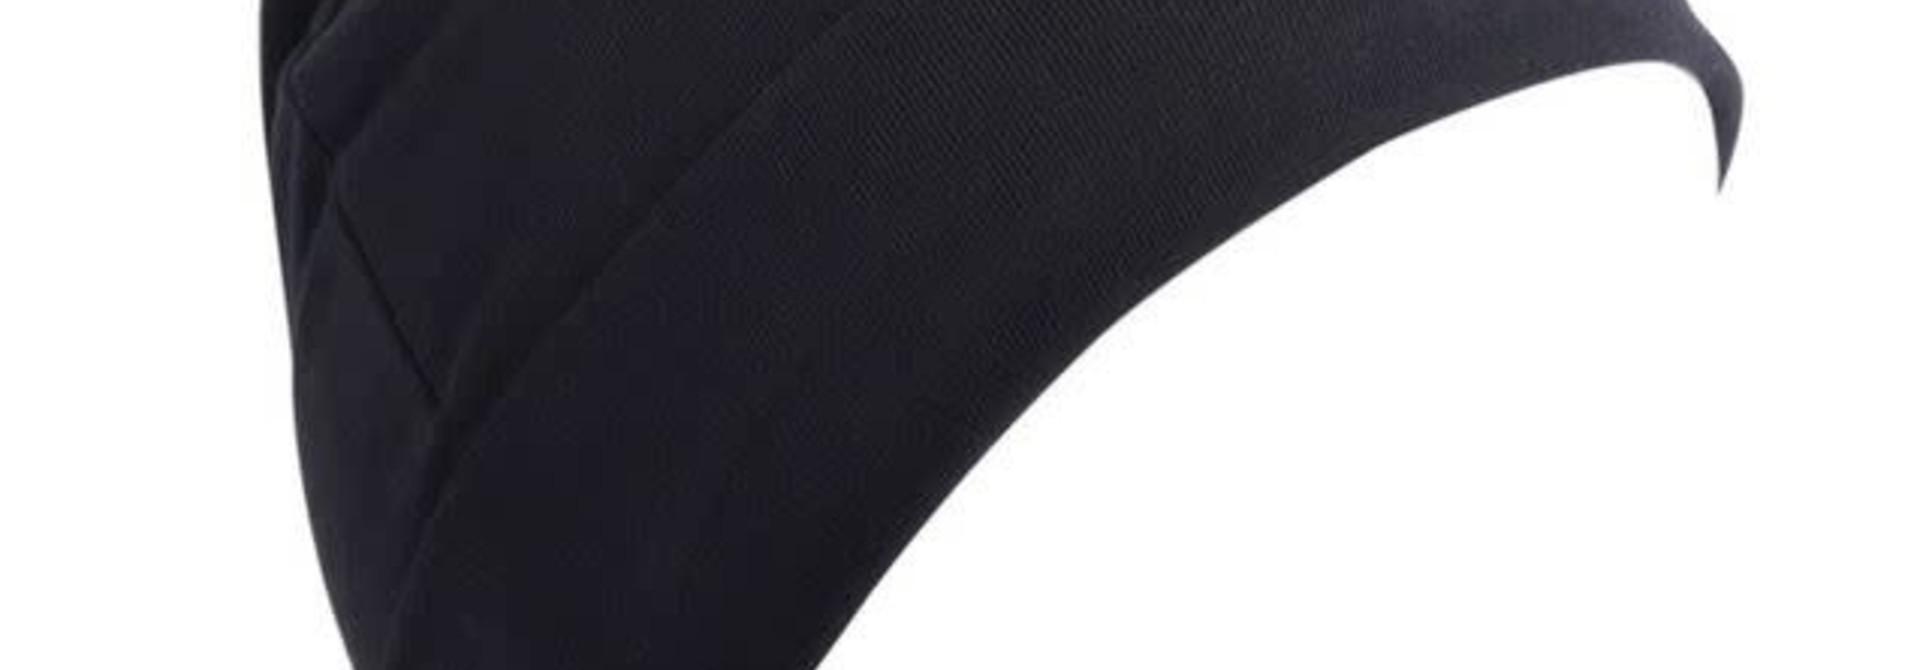 Tuque  Coton - BOSTON V20 Noir